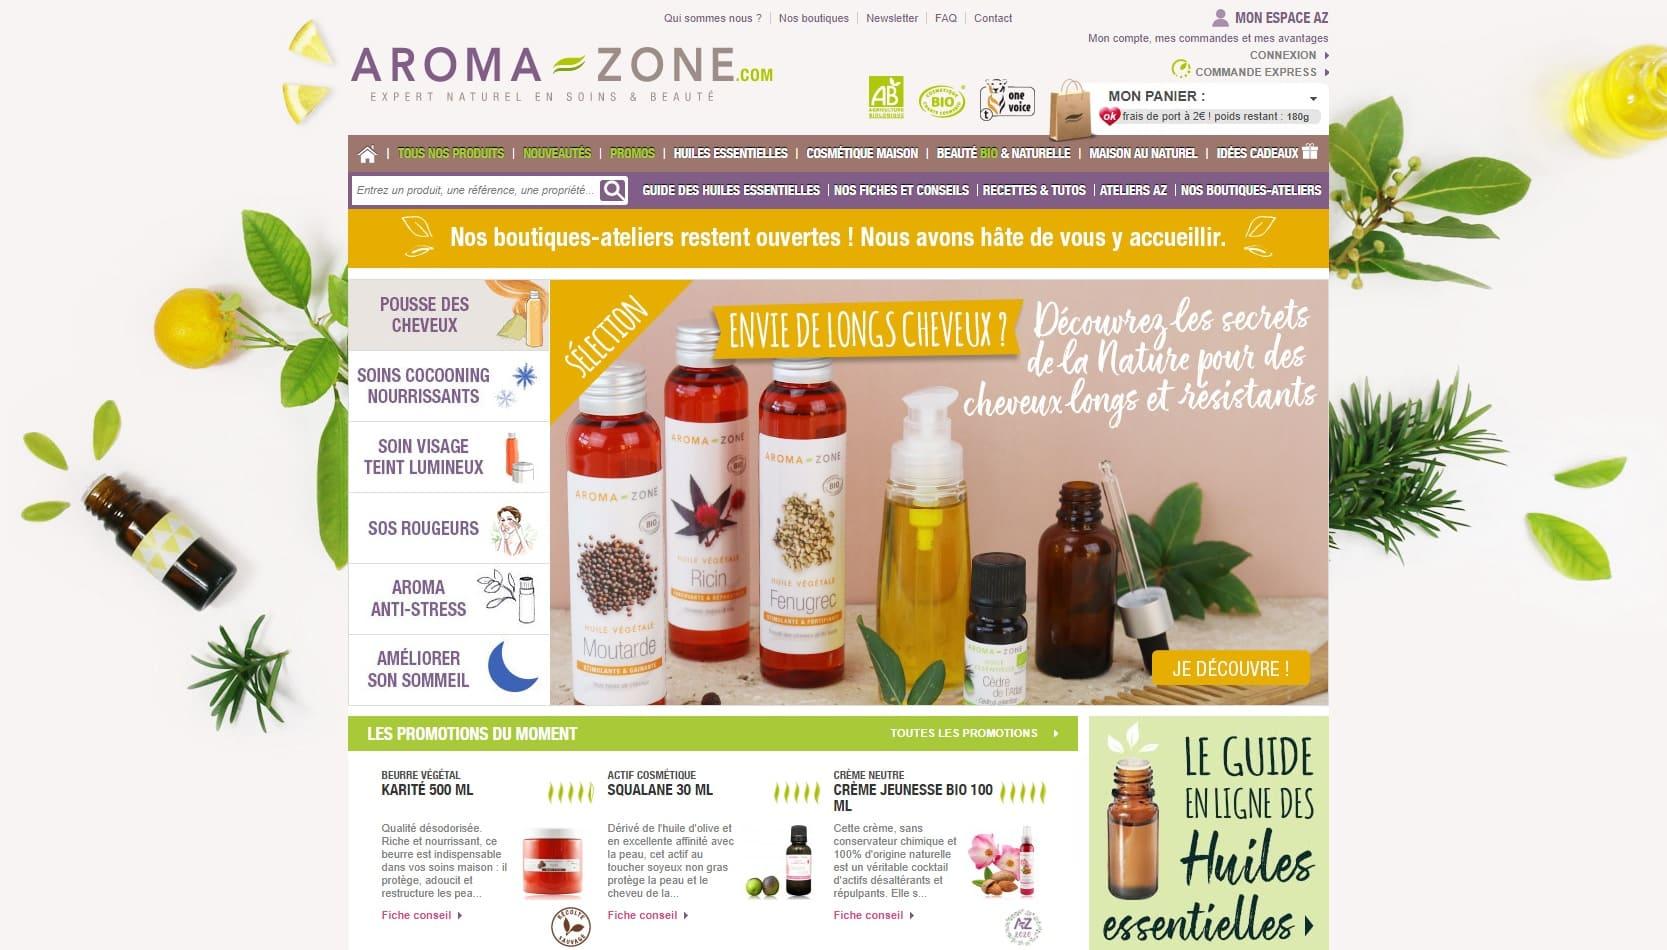 marque-de-cosmetiques-francaises-aroma-zone-web